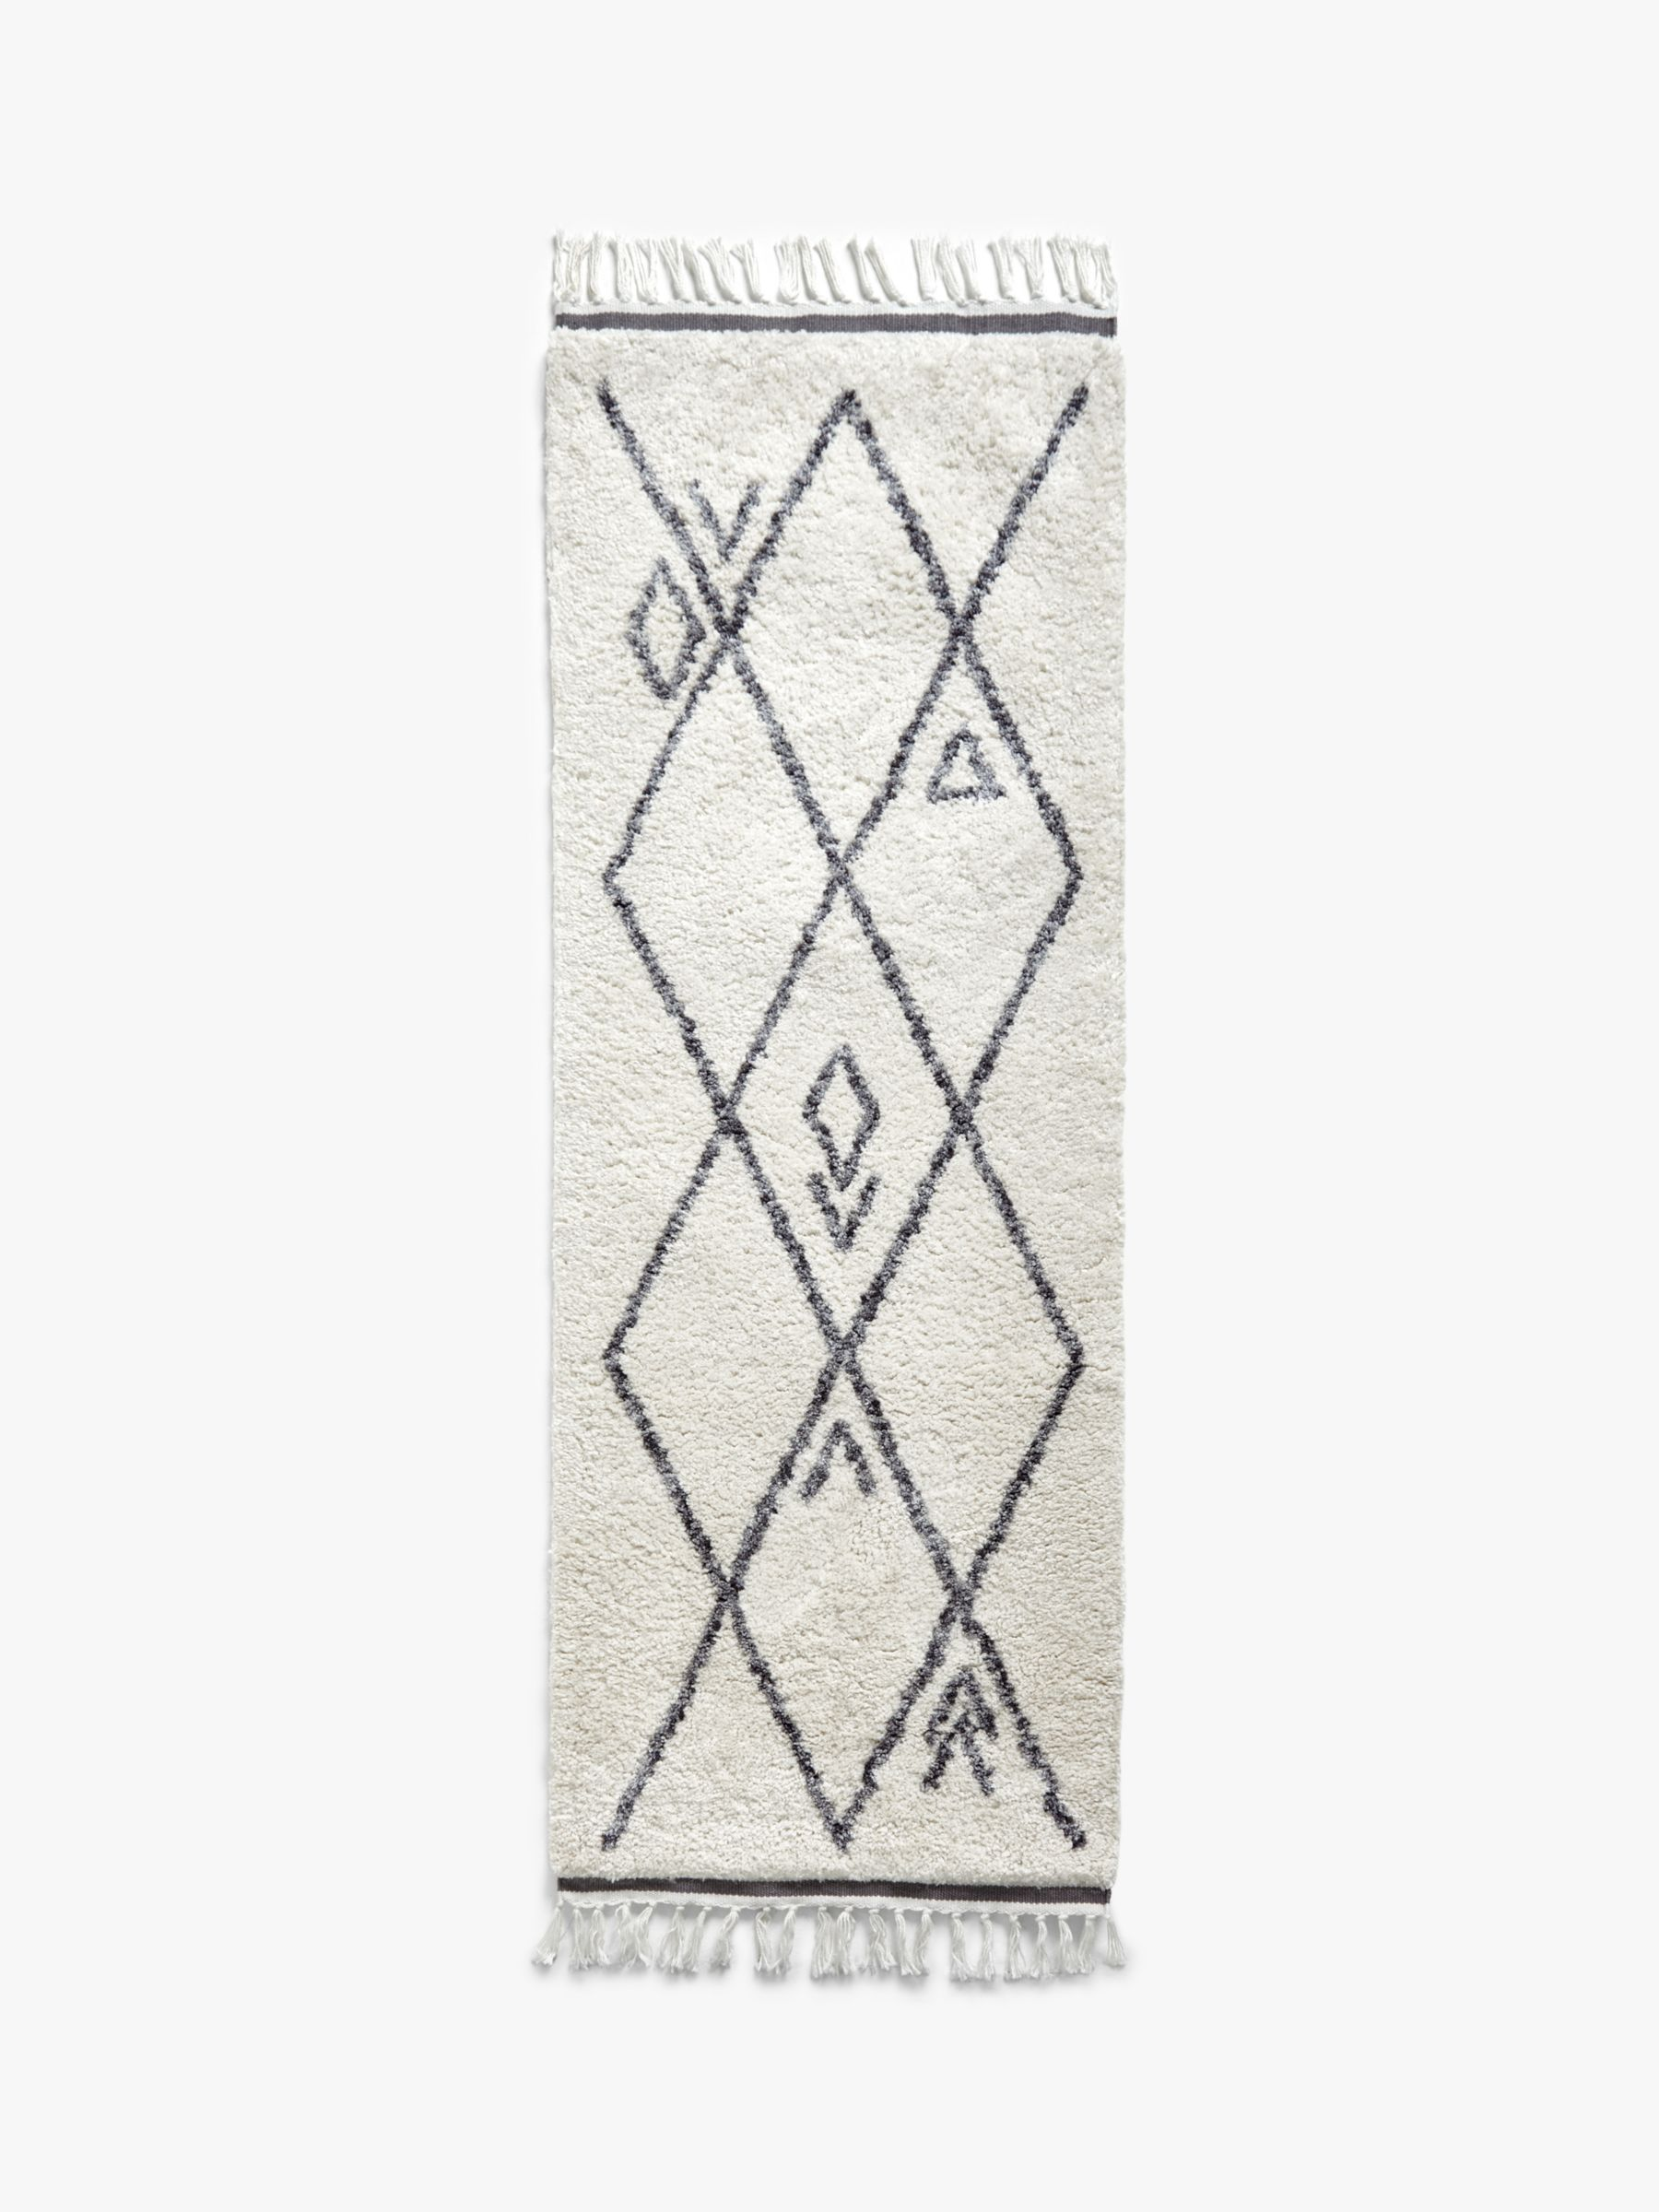 ANYDAY John Lewis & Partners Berber Runner Style Rug, L200 x W70 cm, Grey